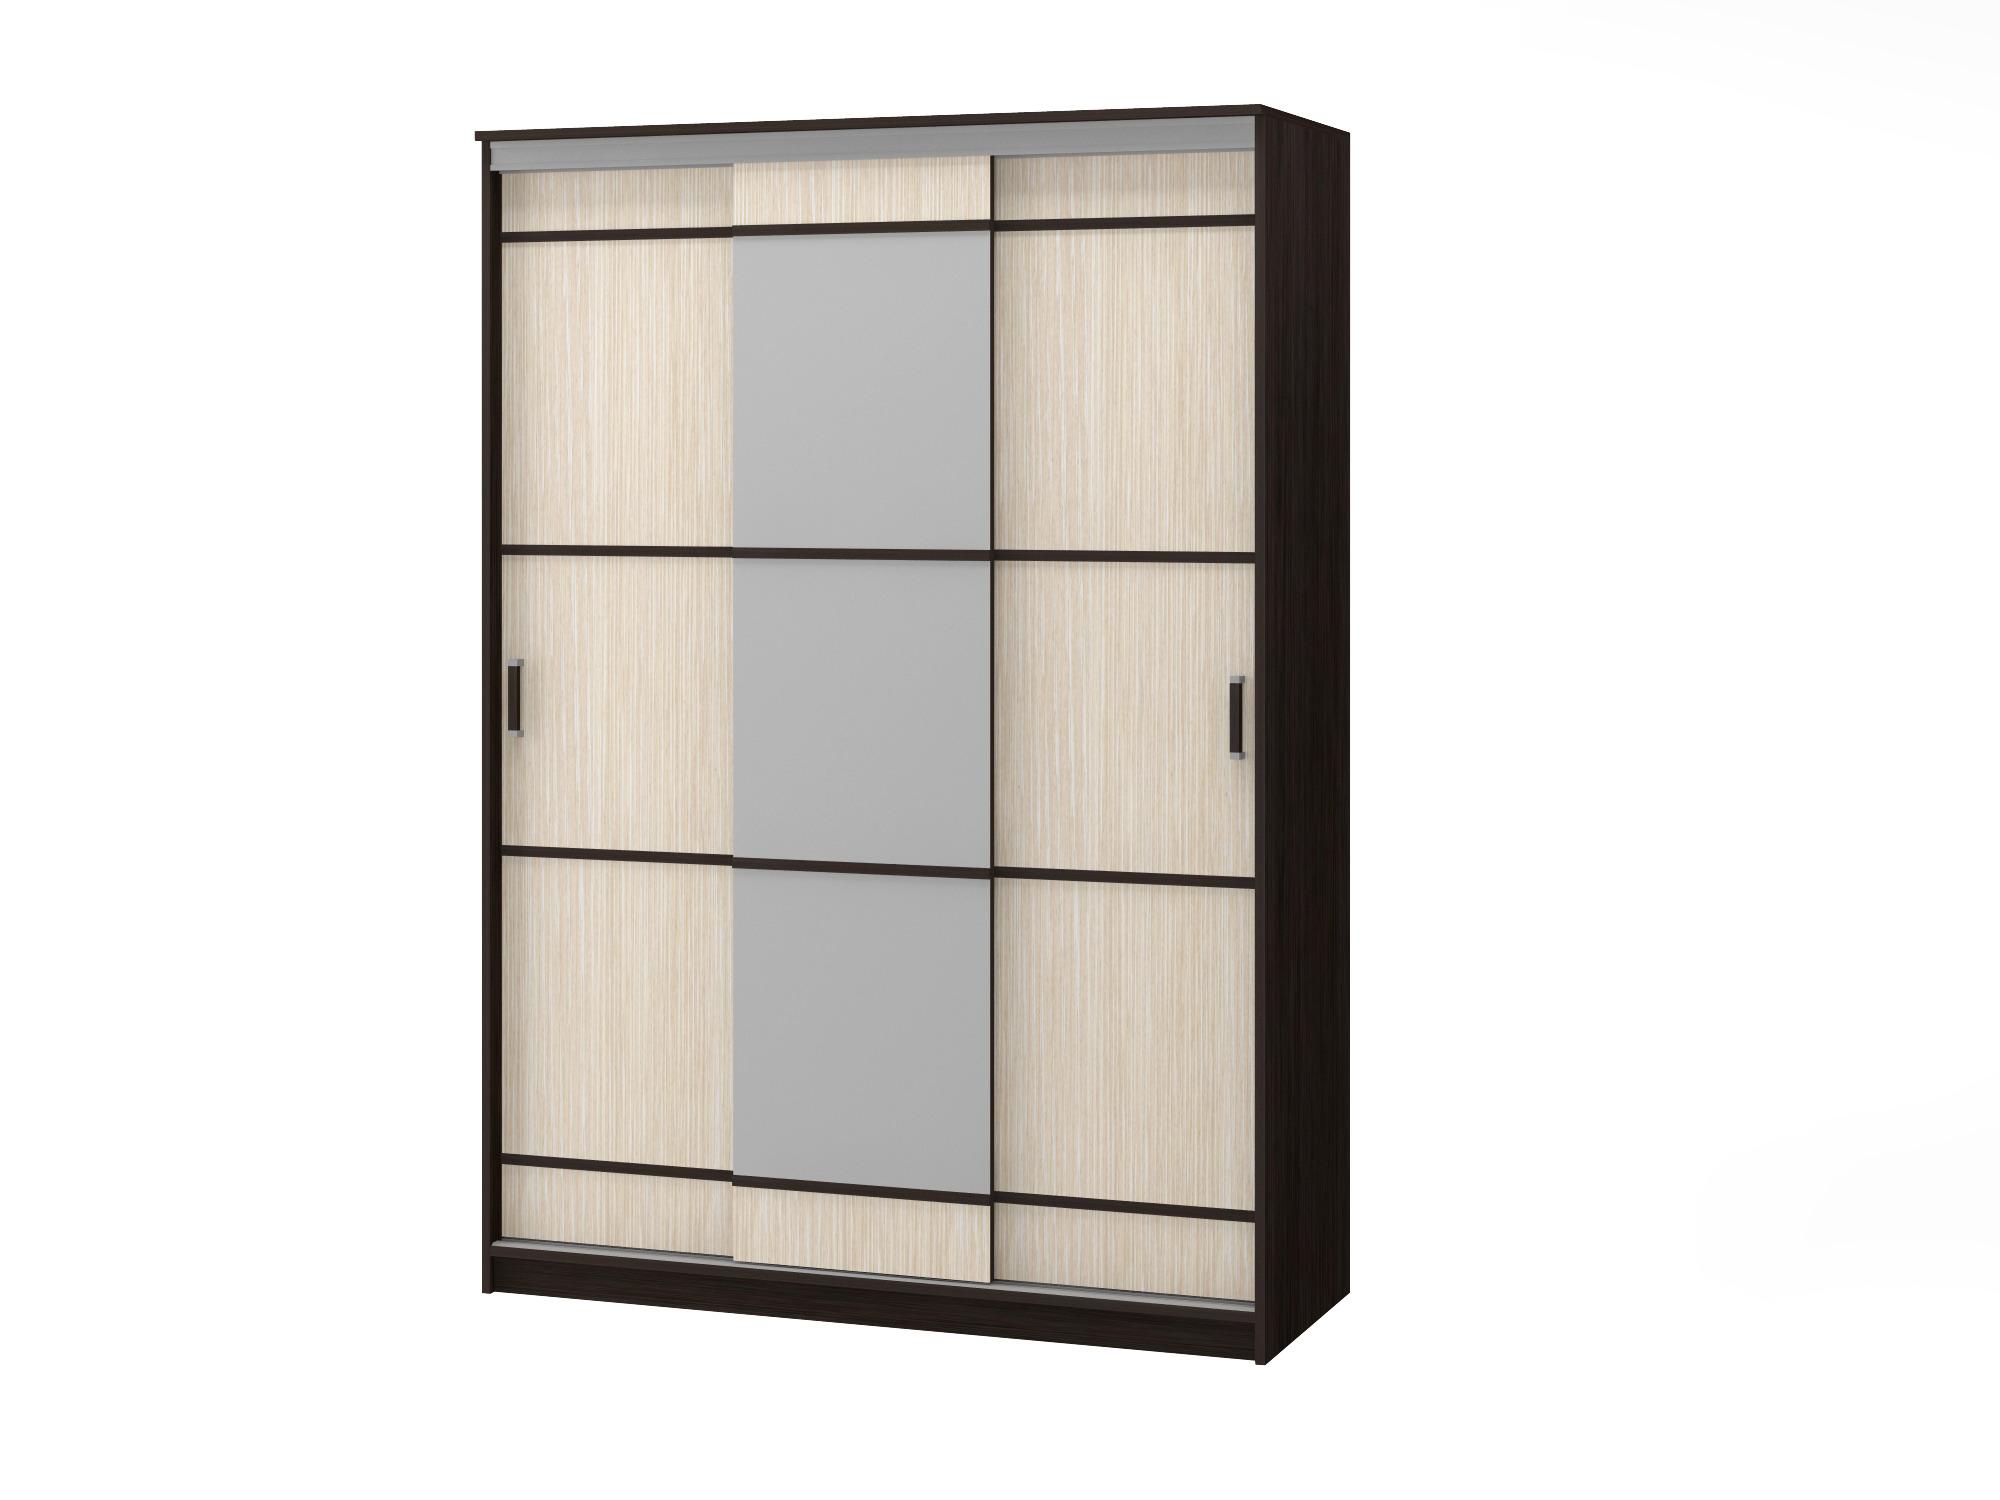 Продажа мебели в интернет-магазине ВашаКомната.РФ – фото 1.35